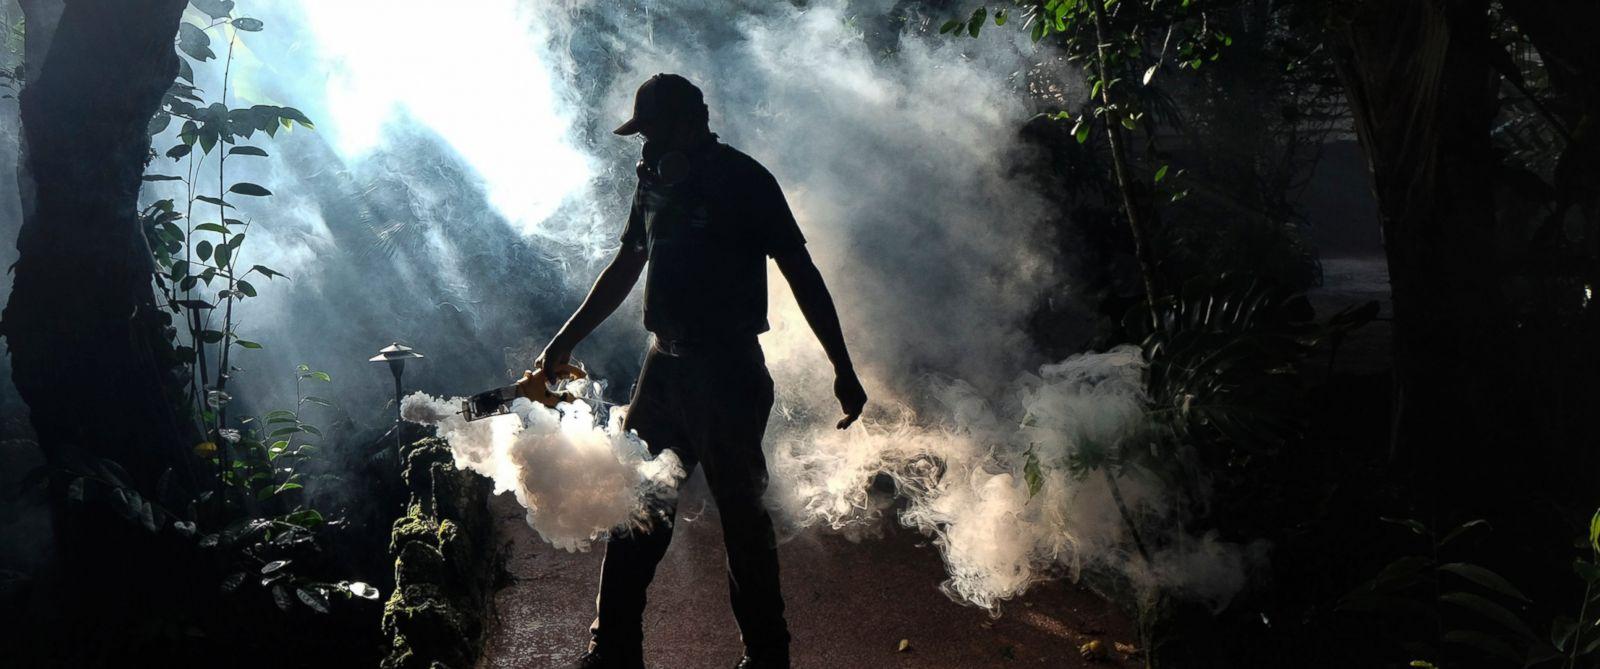 Good Morning America Zika Virus : Florida zika virus outbreak students to get lessons